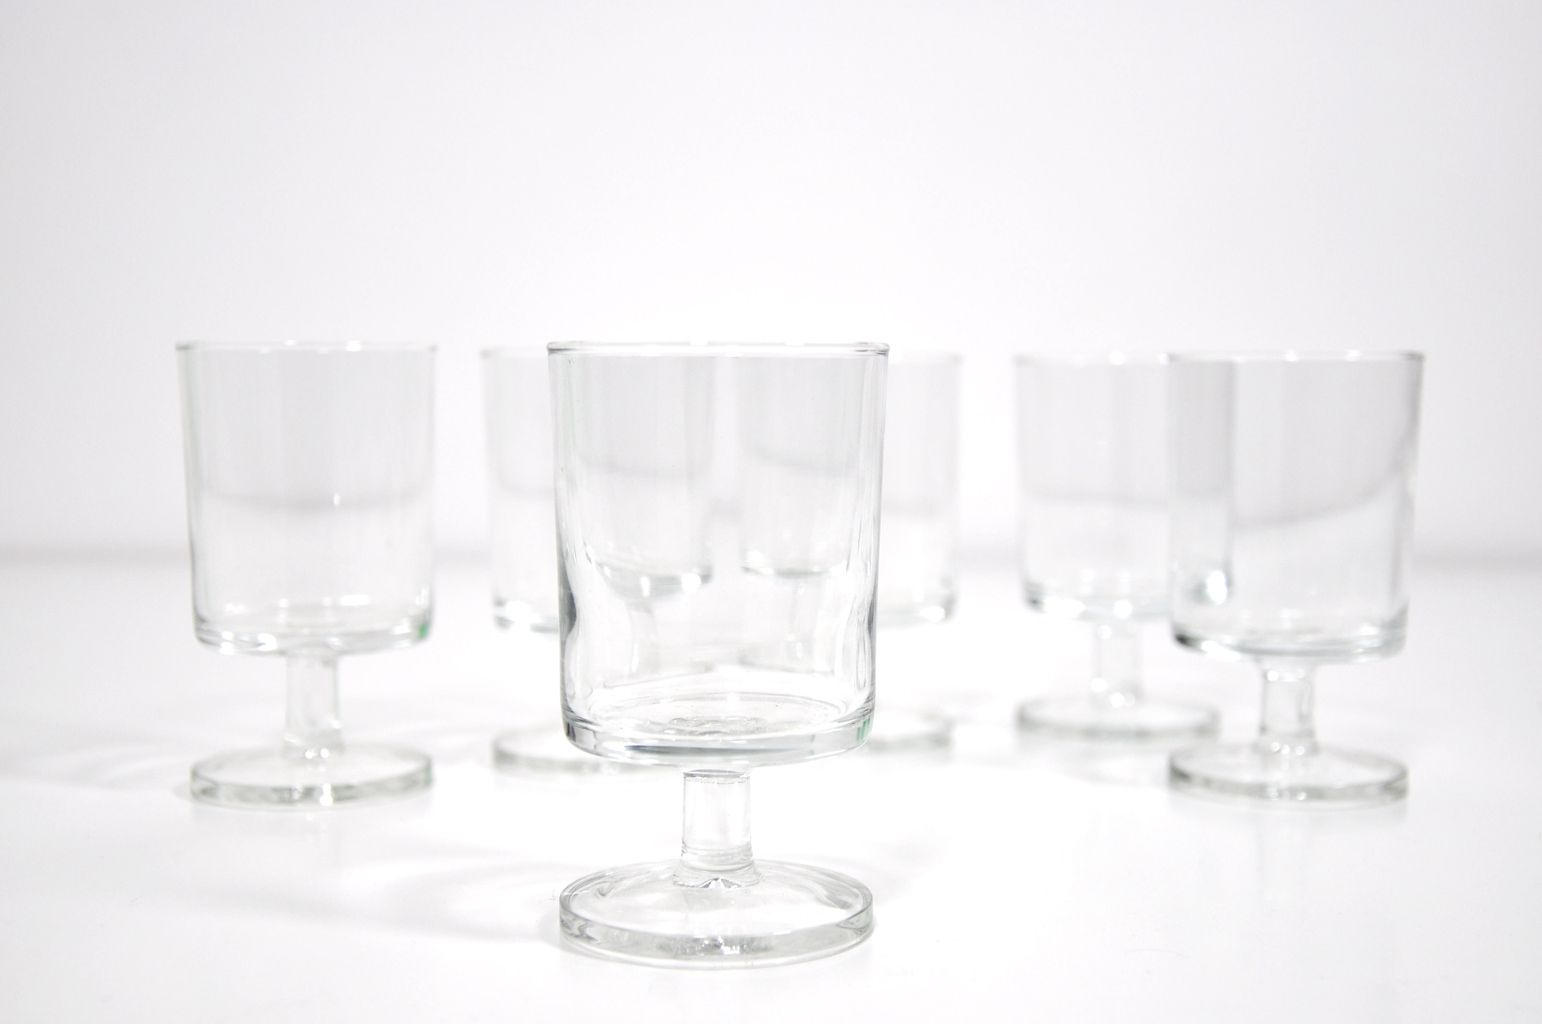 verre vin cavalier luminarc ann es 70 mobilier vintage bel ordinaire glassware. Black Bedroom Furniture Sets. Home Design Ideas